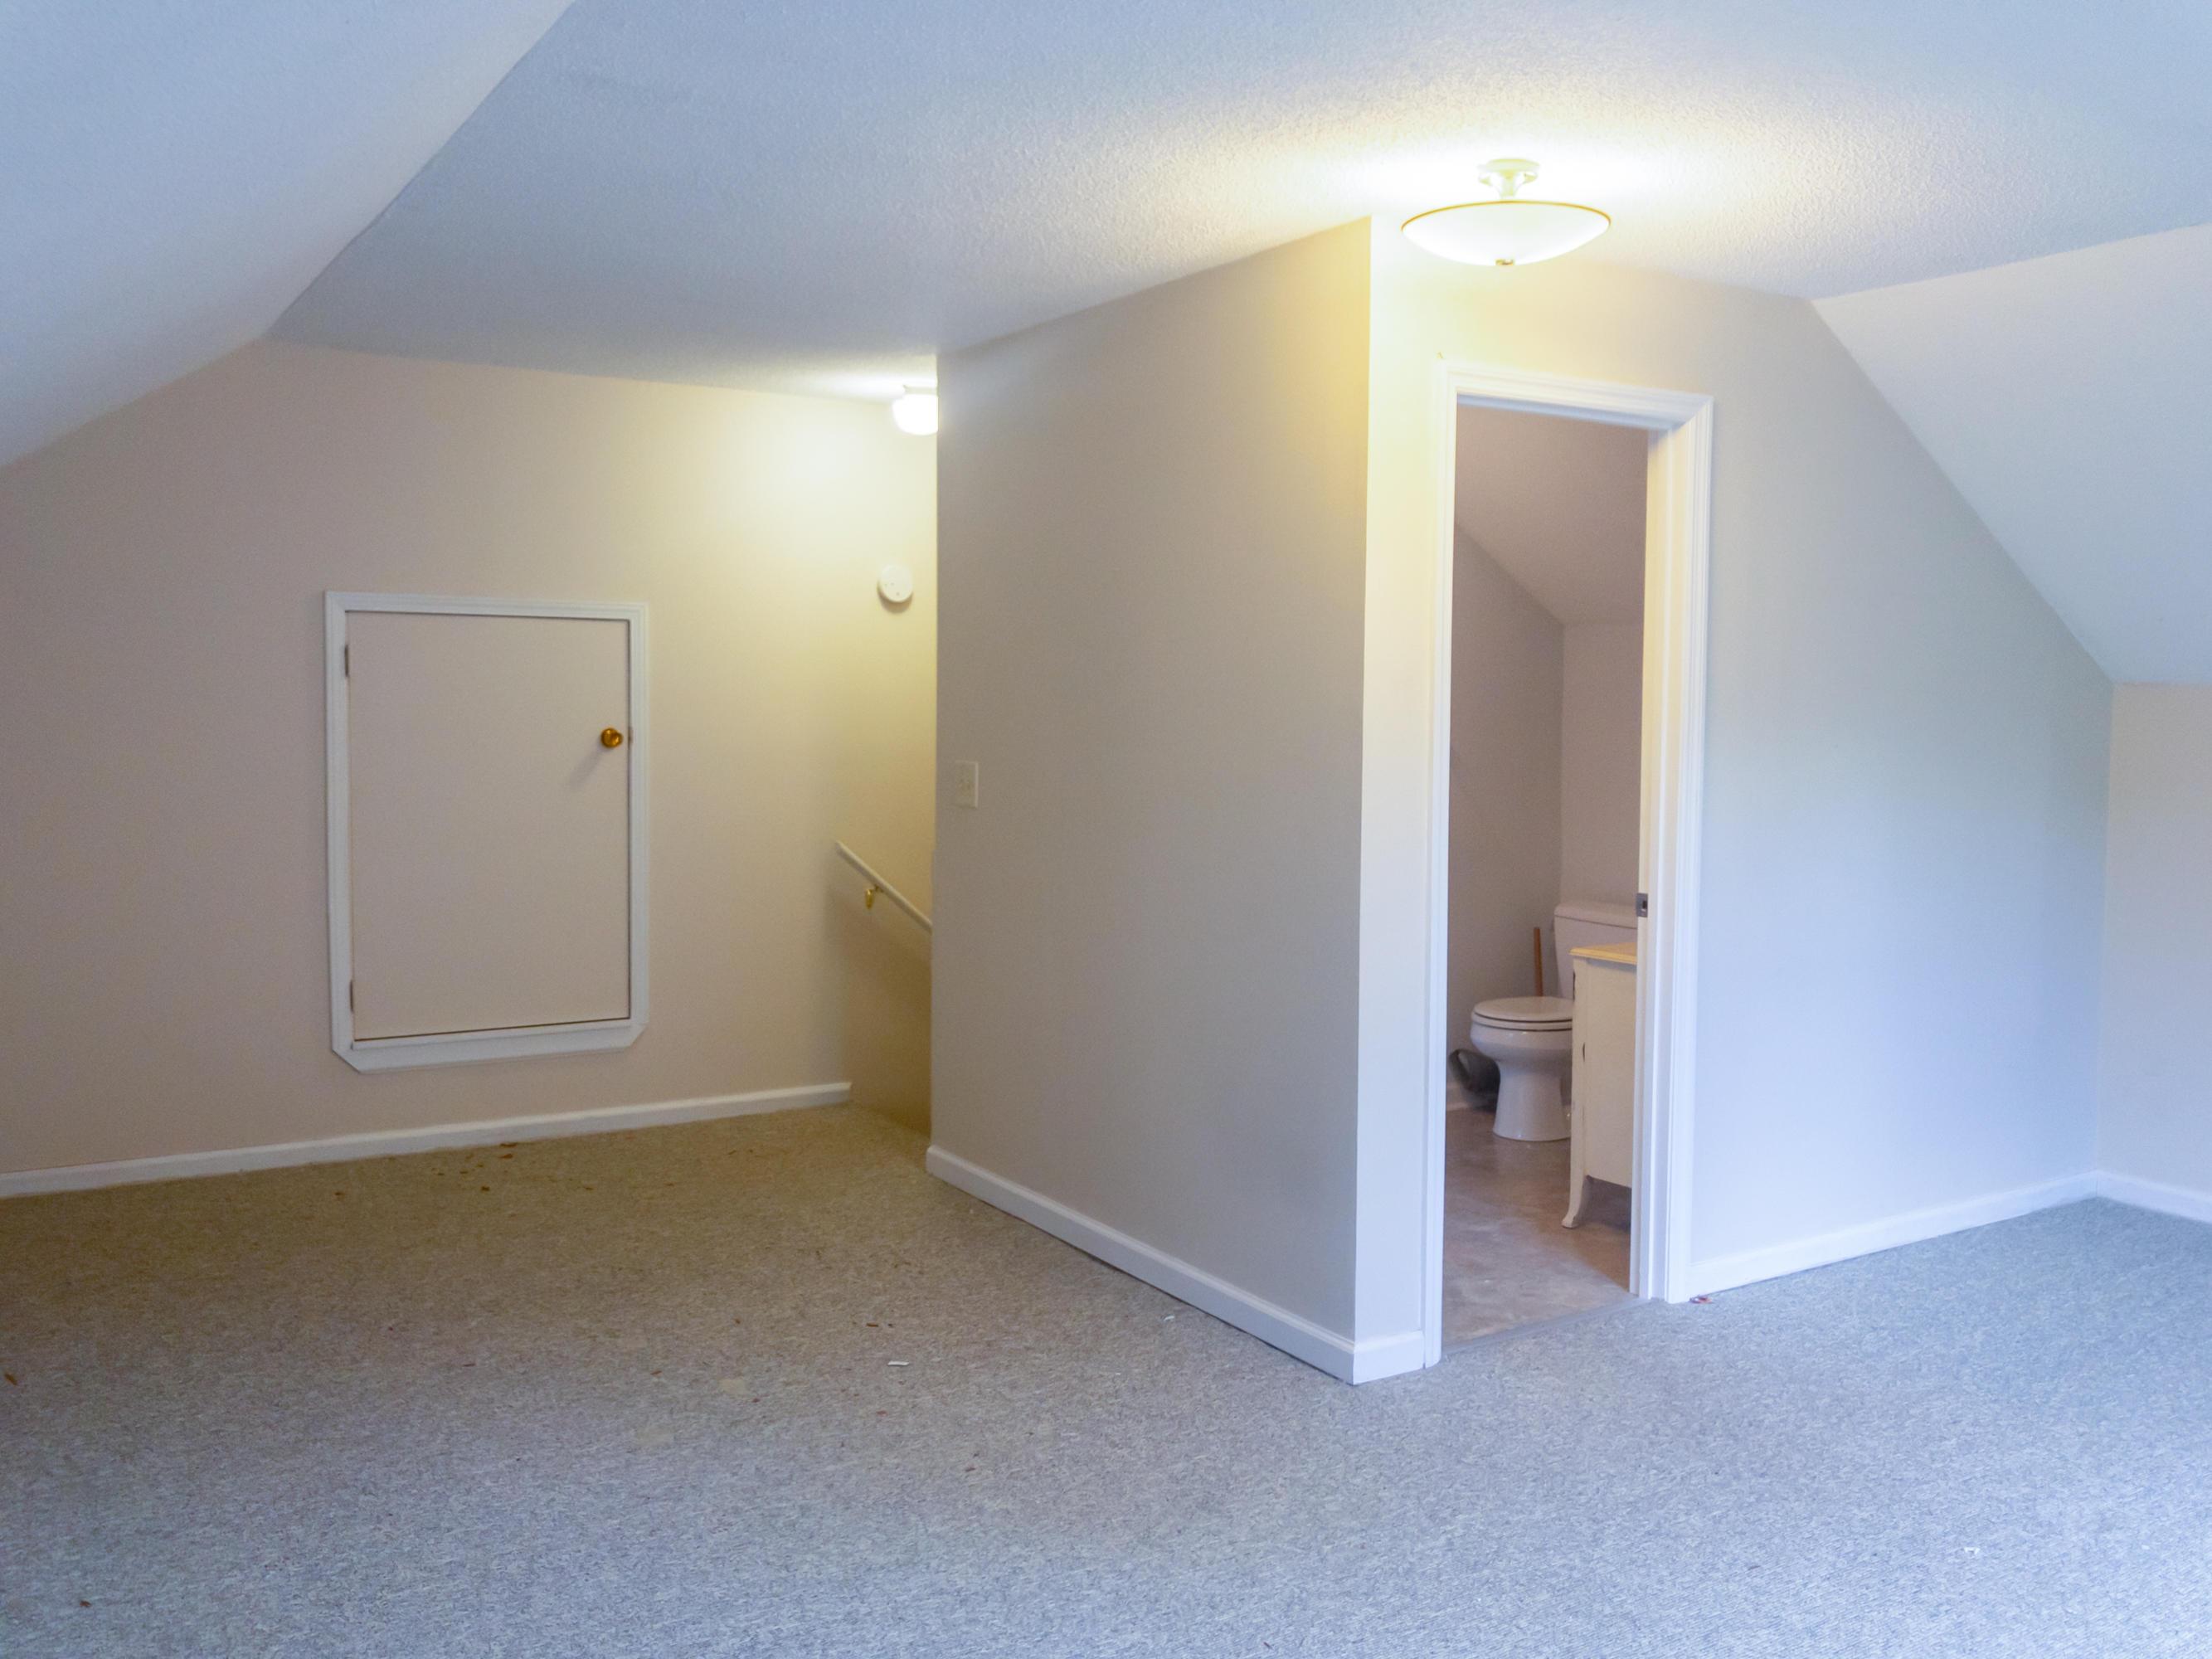 Wakendaw Lakes Homes For Sale - 1251 Vagabond, Mount Pleasant, SC - 42